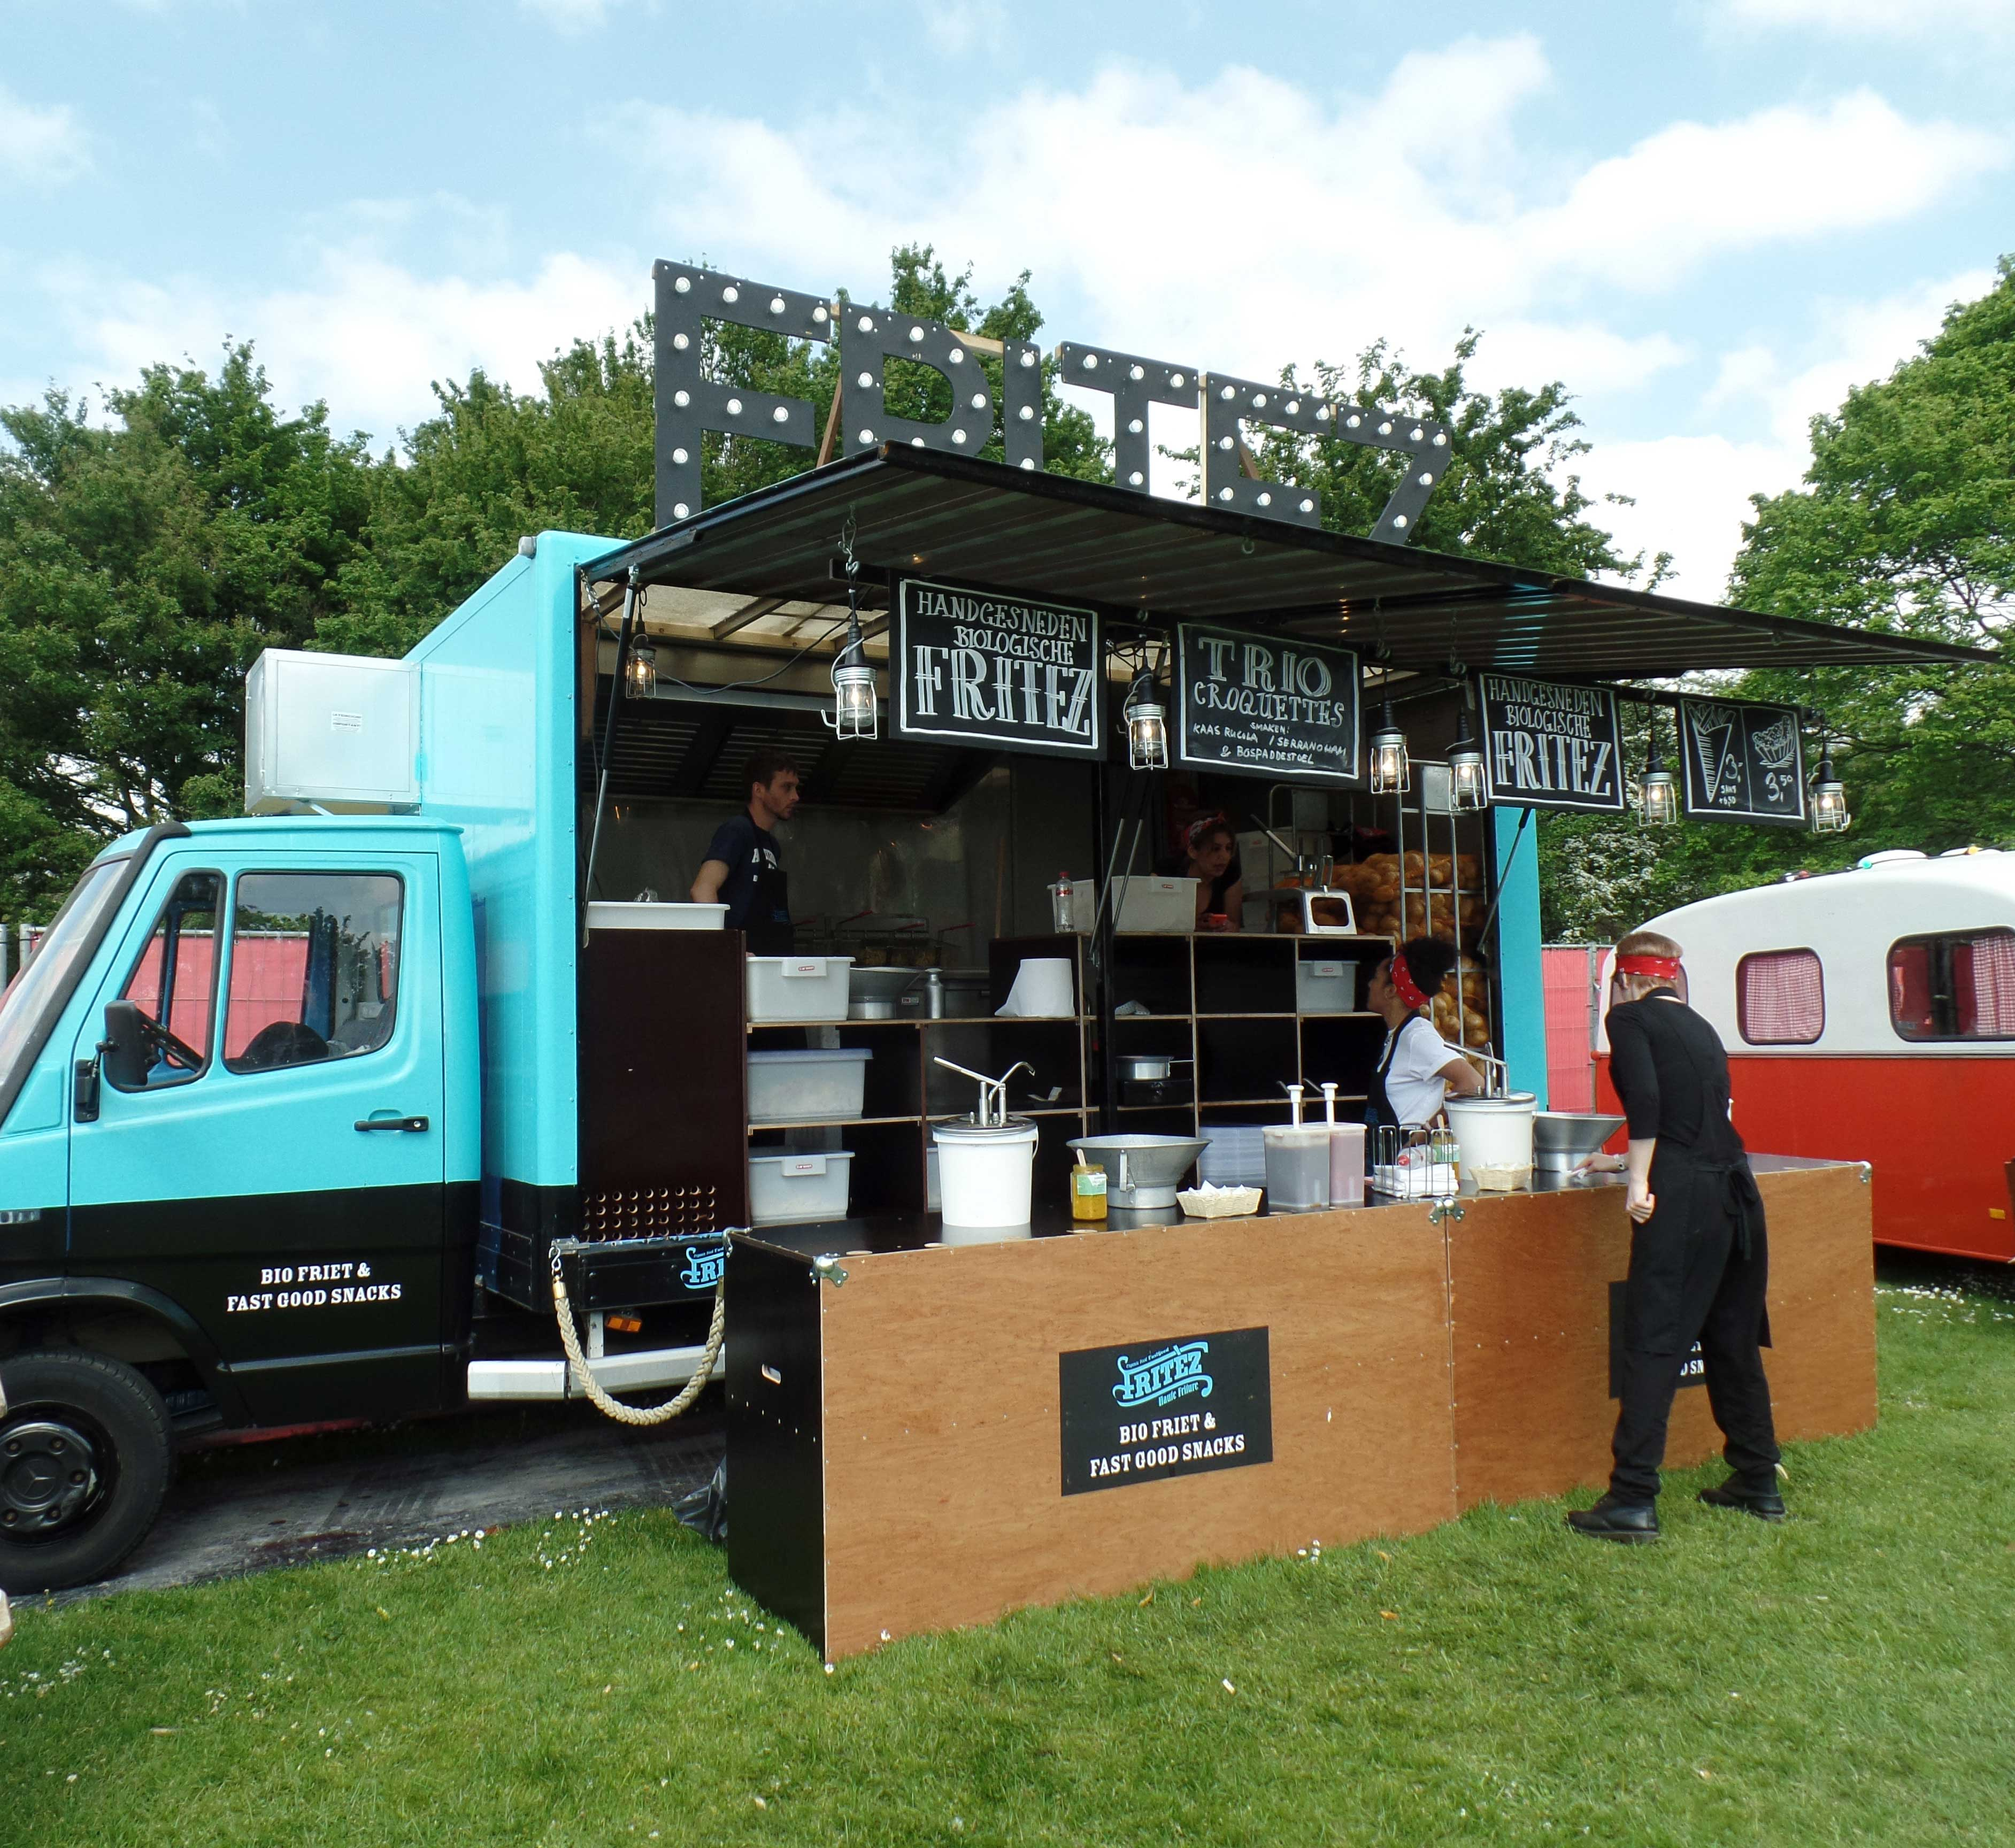 food truck festival trek in rotterdam. Black Bedroom Furniture Sets. Home Design Ideas